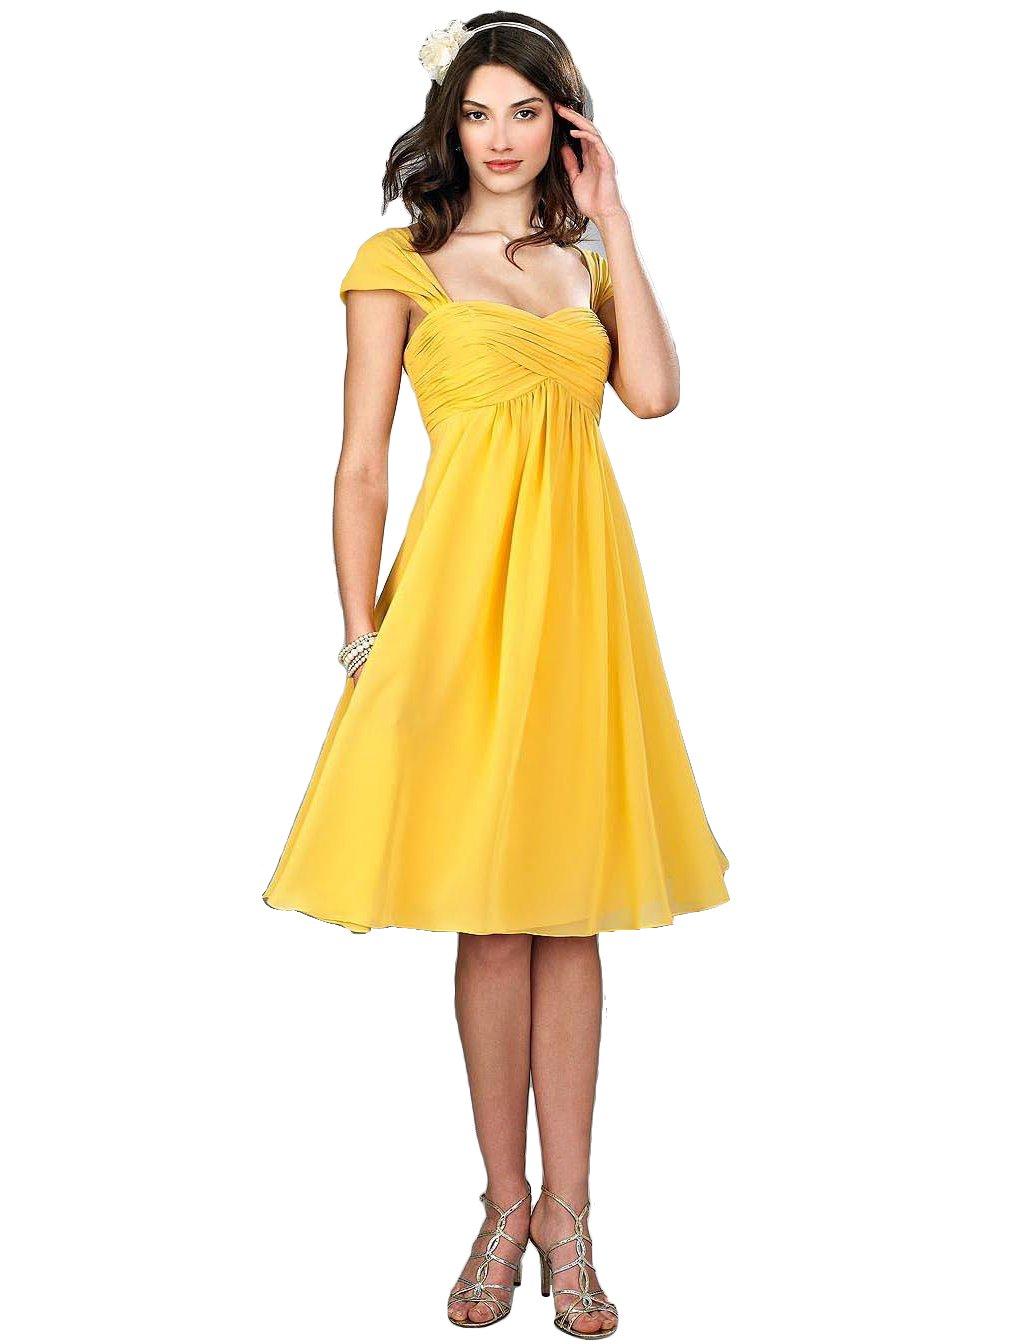 VaniaDress Women Chiffon Tea Length Bridesmaid Dress Party Gowns V274LF Yellow US26W